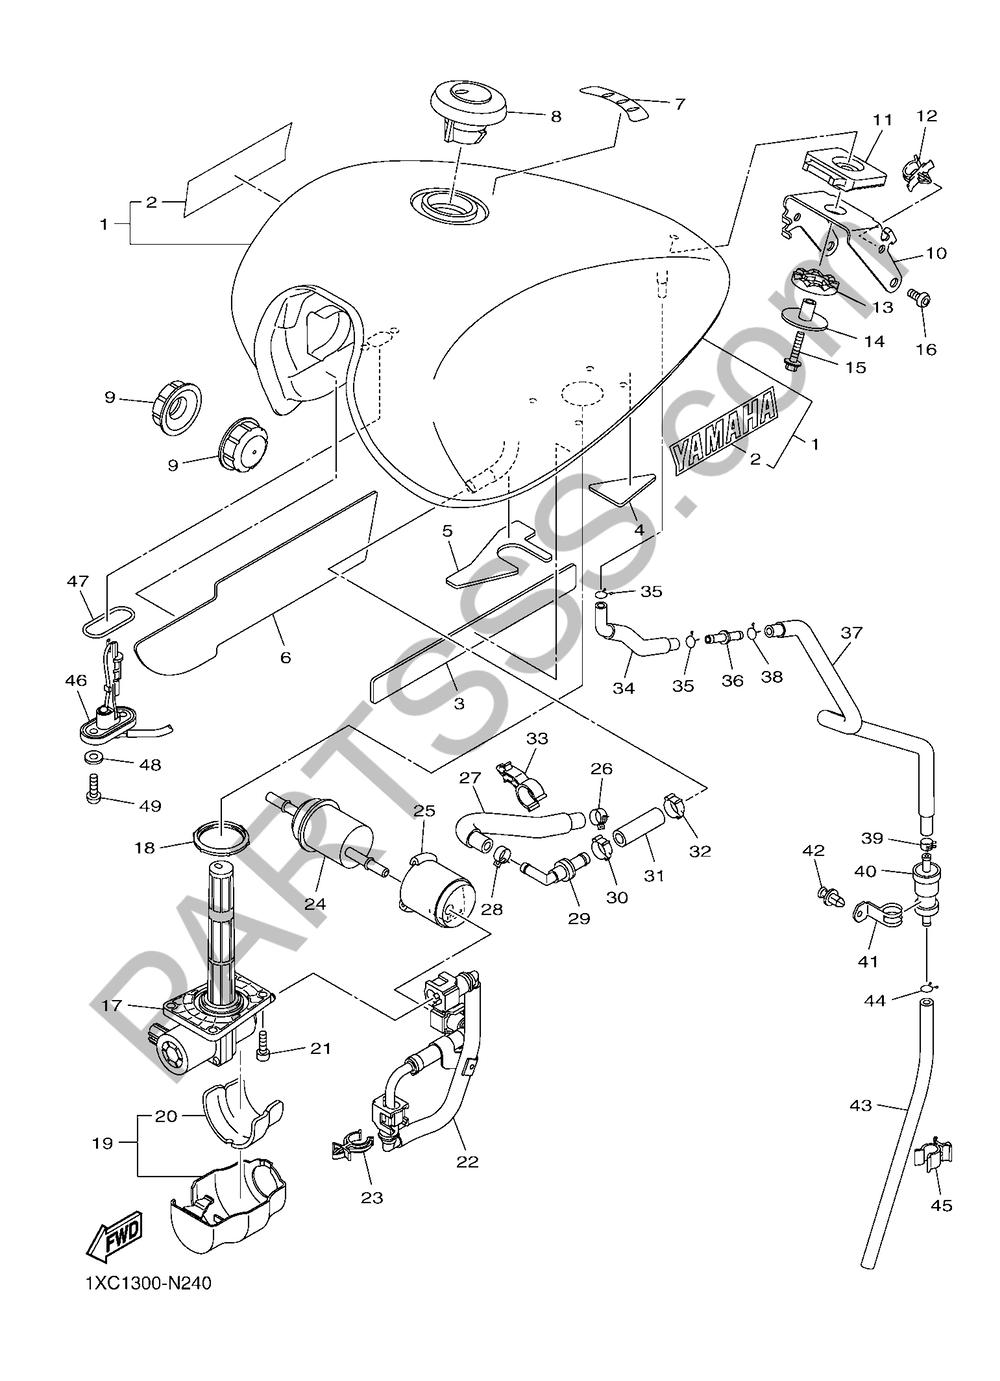 DEPOSITO DE COMBUSTIBLE Yamaha XVS950CU 2016